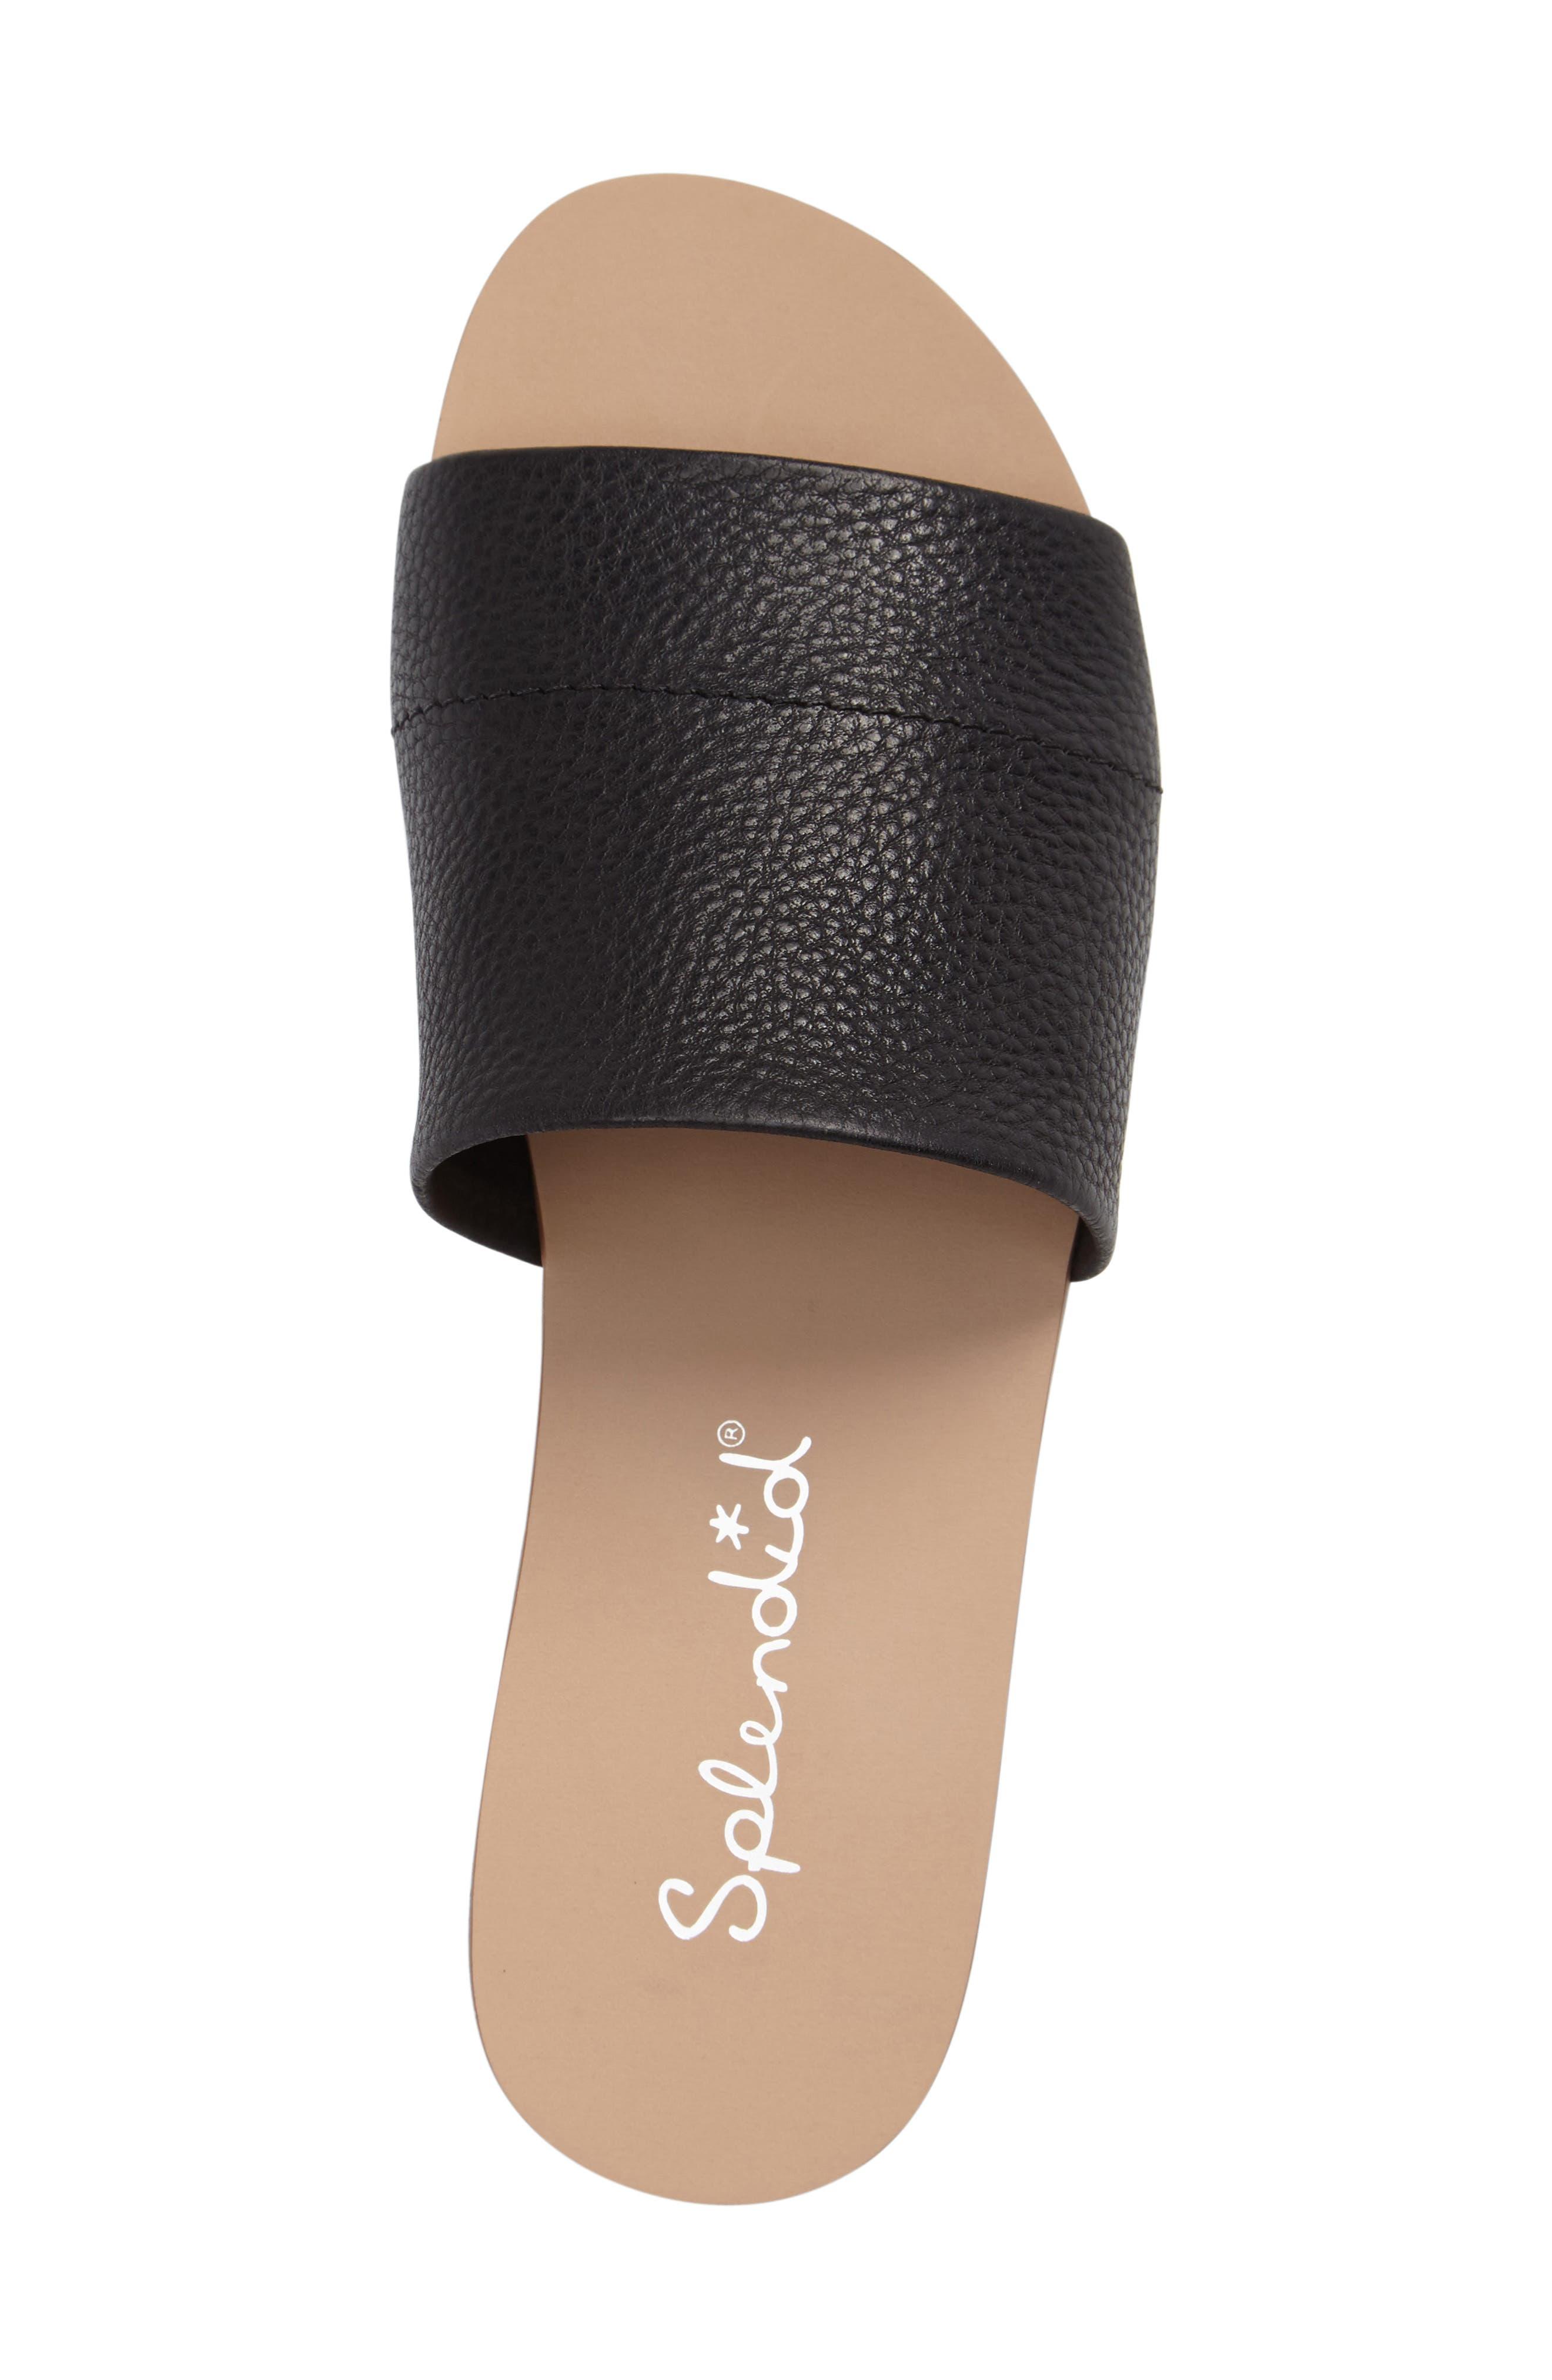 Jazz Slide Sandal,                             Alternate thumbnail 3, color,                             Black Leather